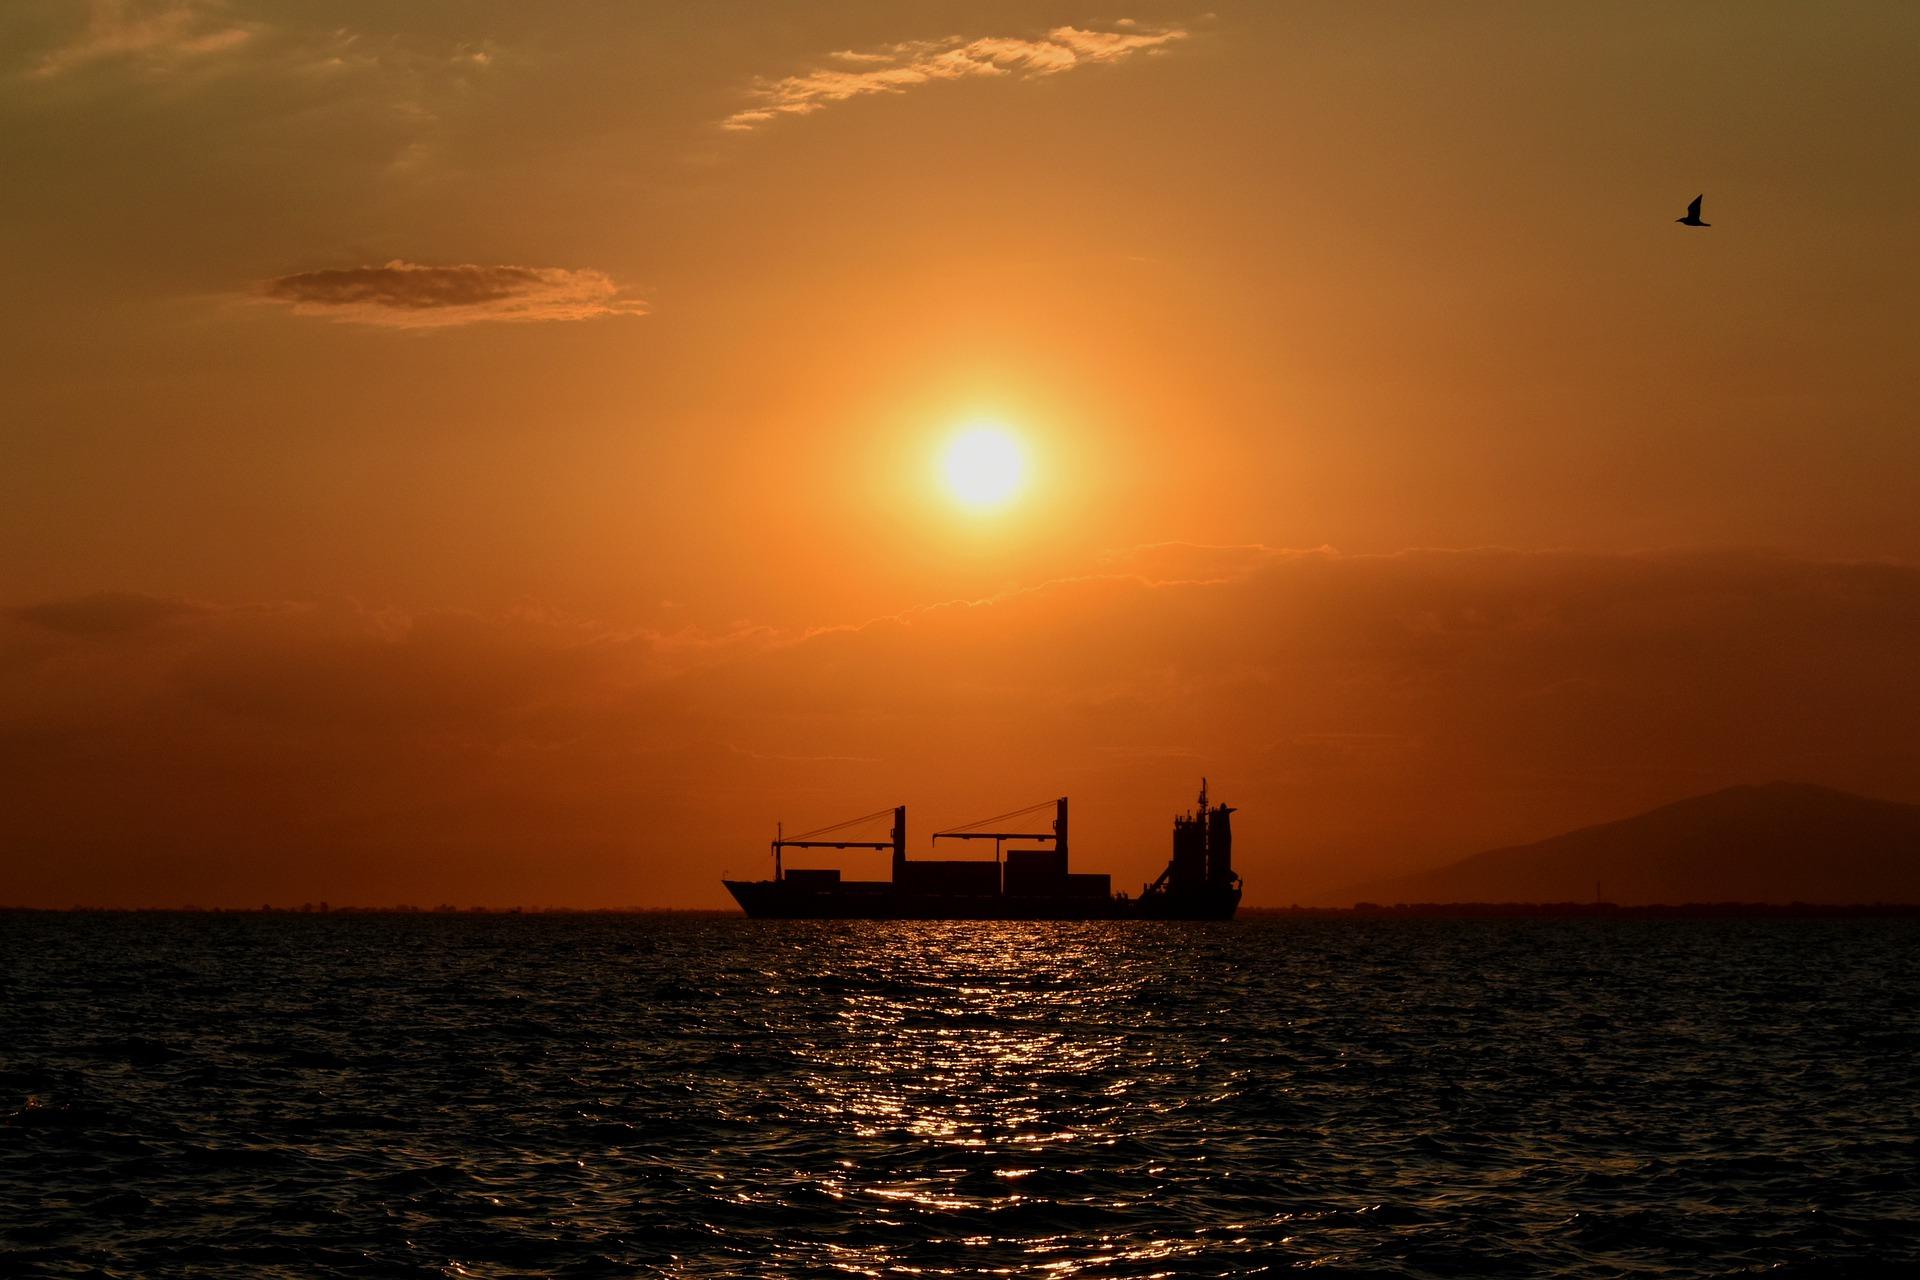 sunset-5410163_1920